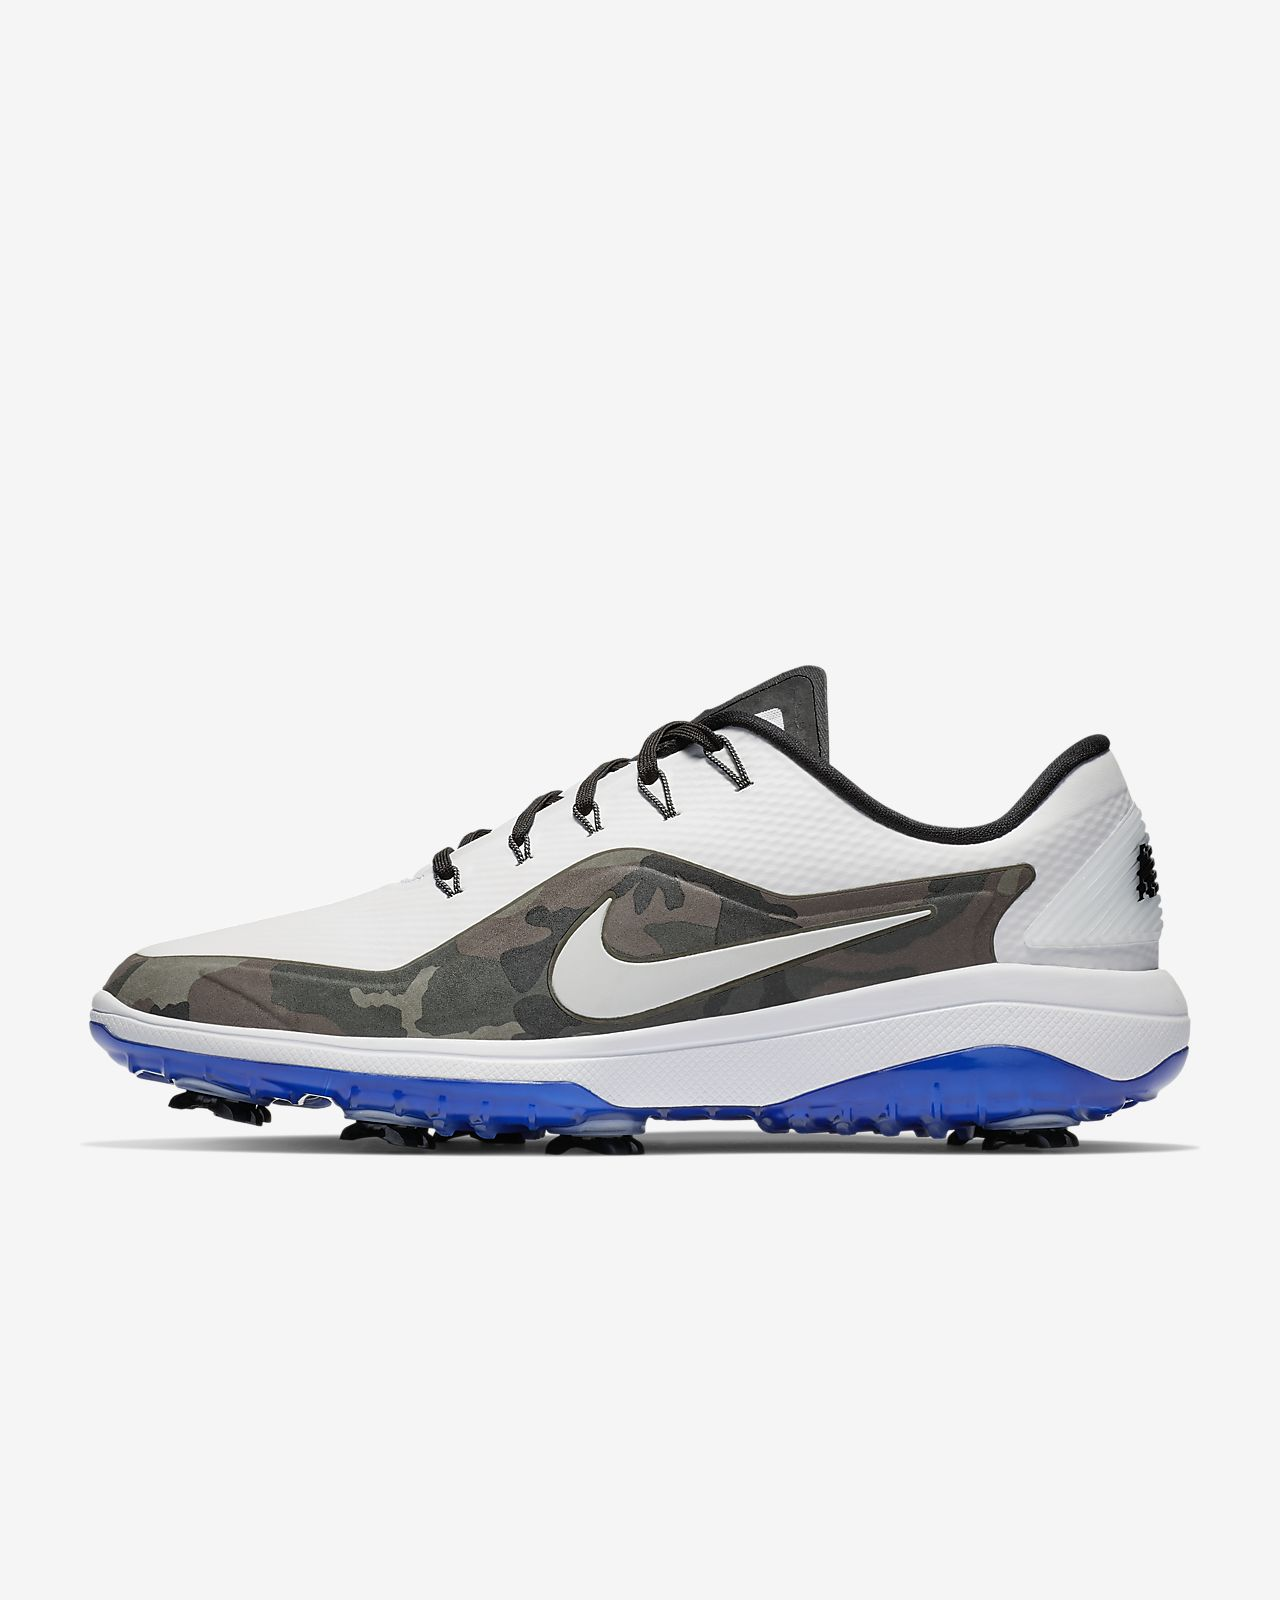 premium selection 5cd2d 0d70b ... Męskie buty do golfa Nike React Vapor 2 NRG